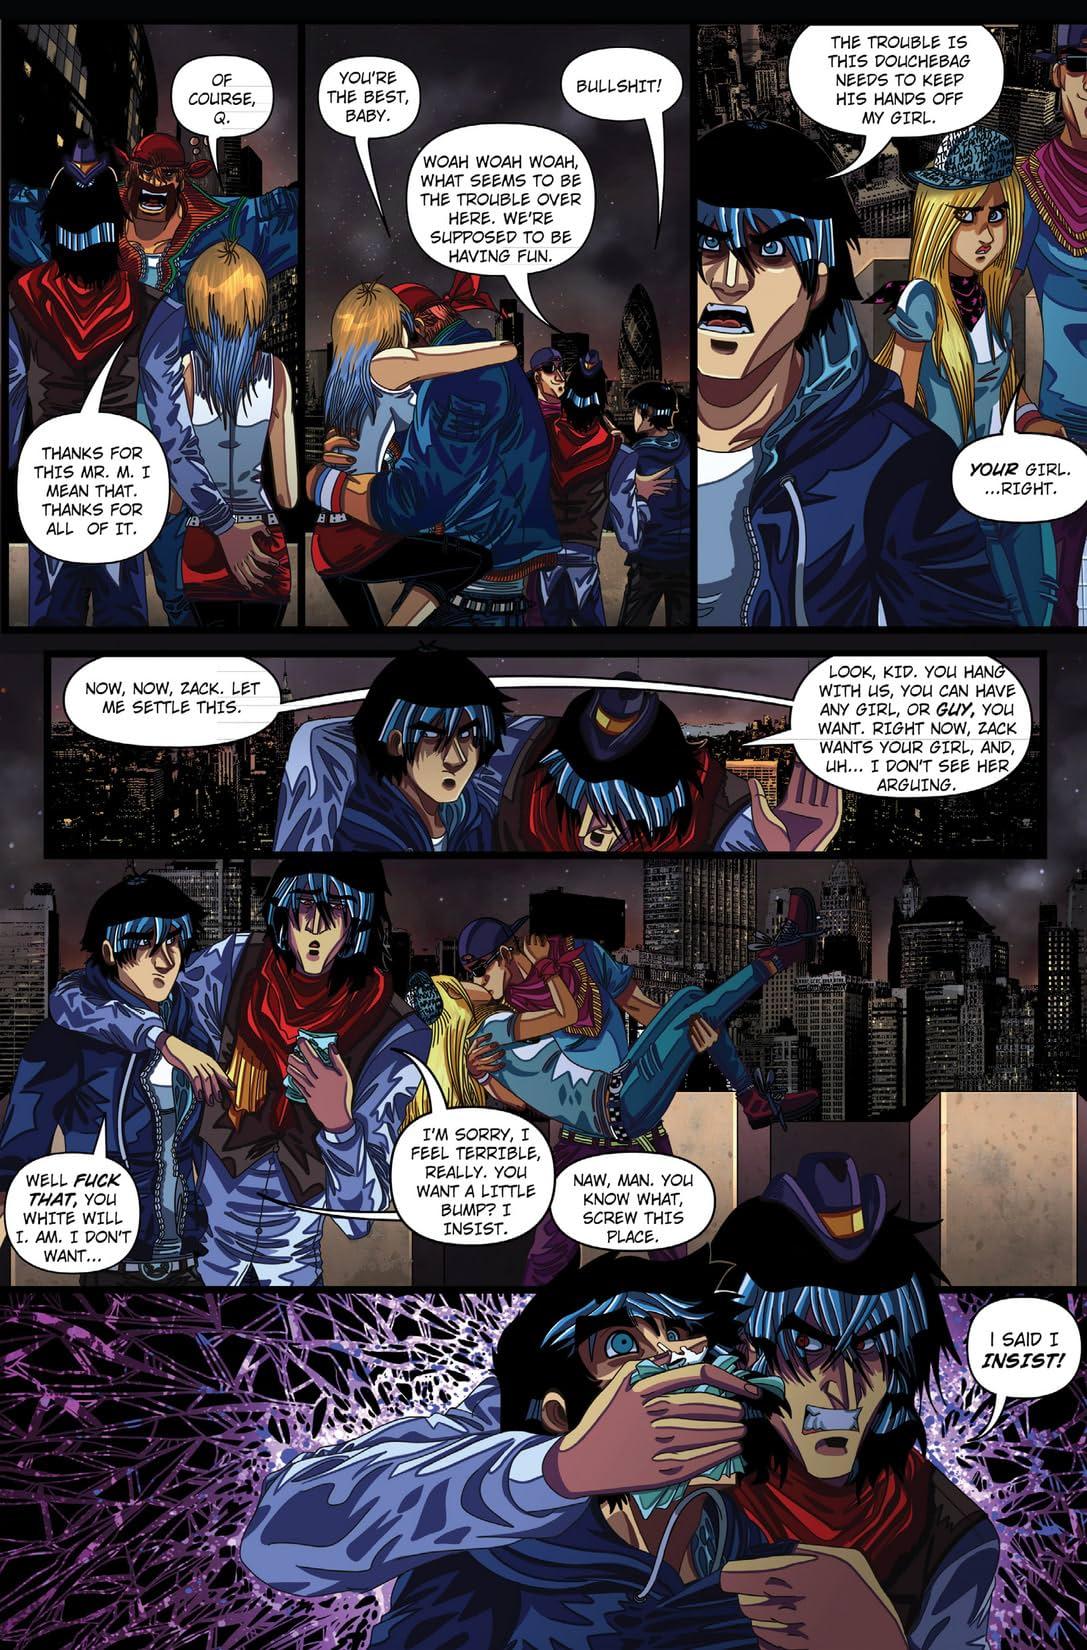 Yumiko: Curse of the Merch Girl #5